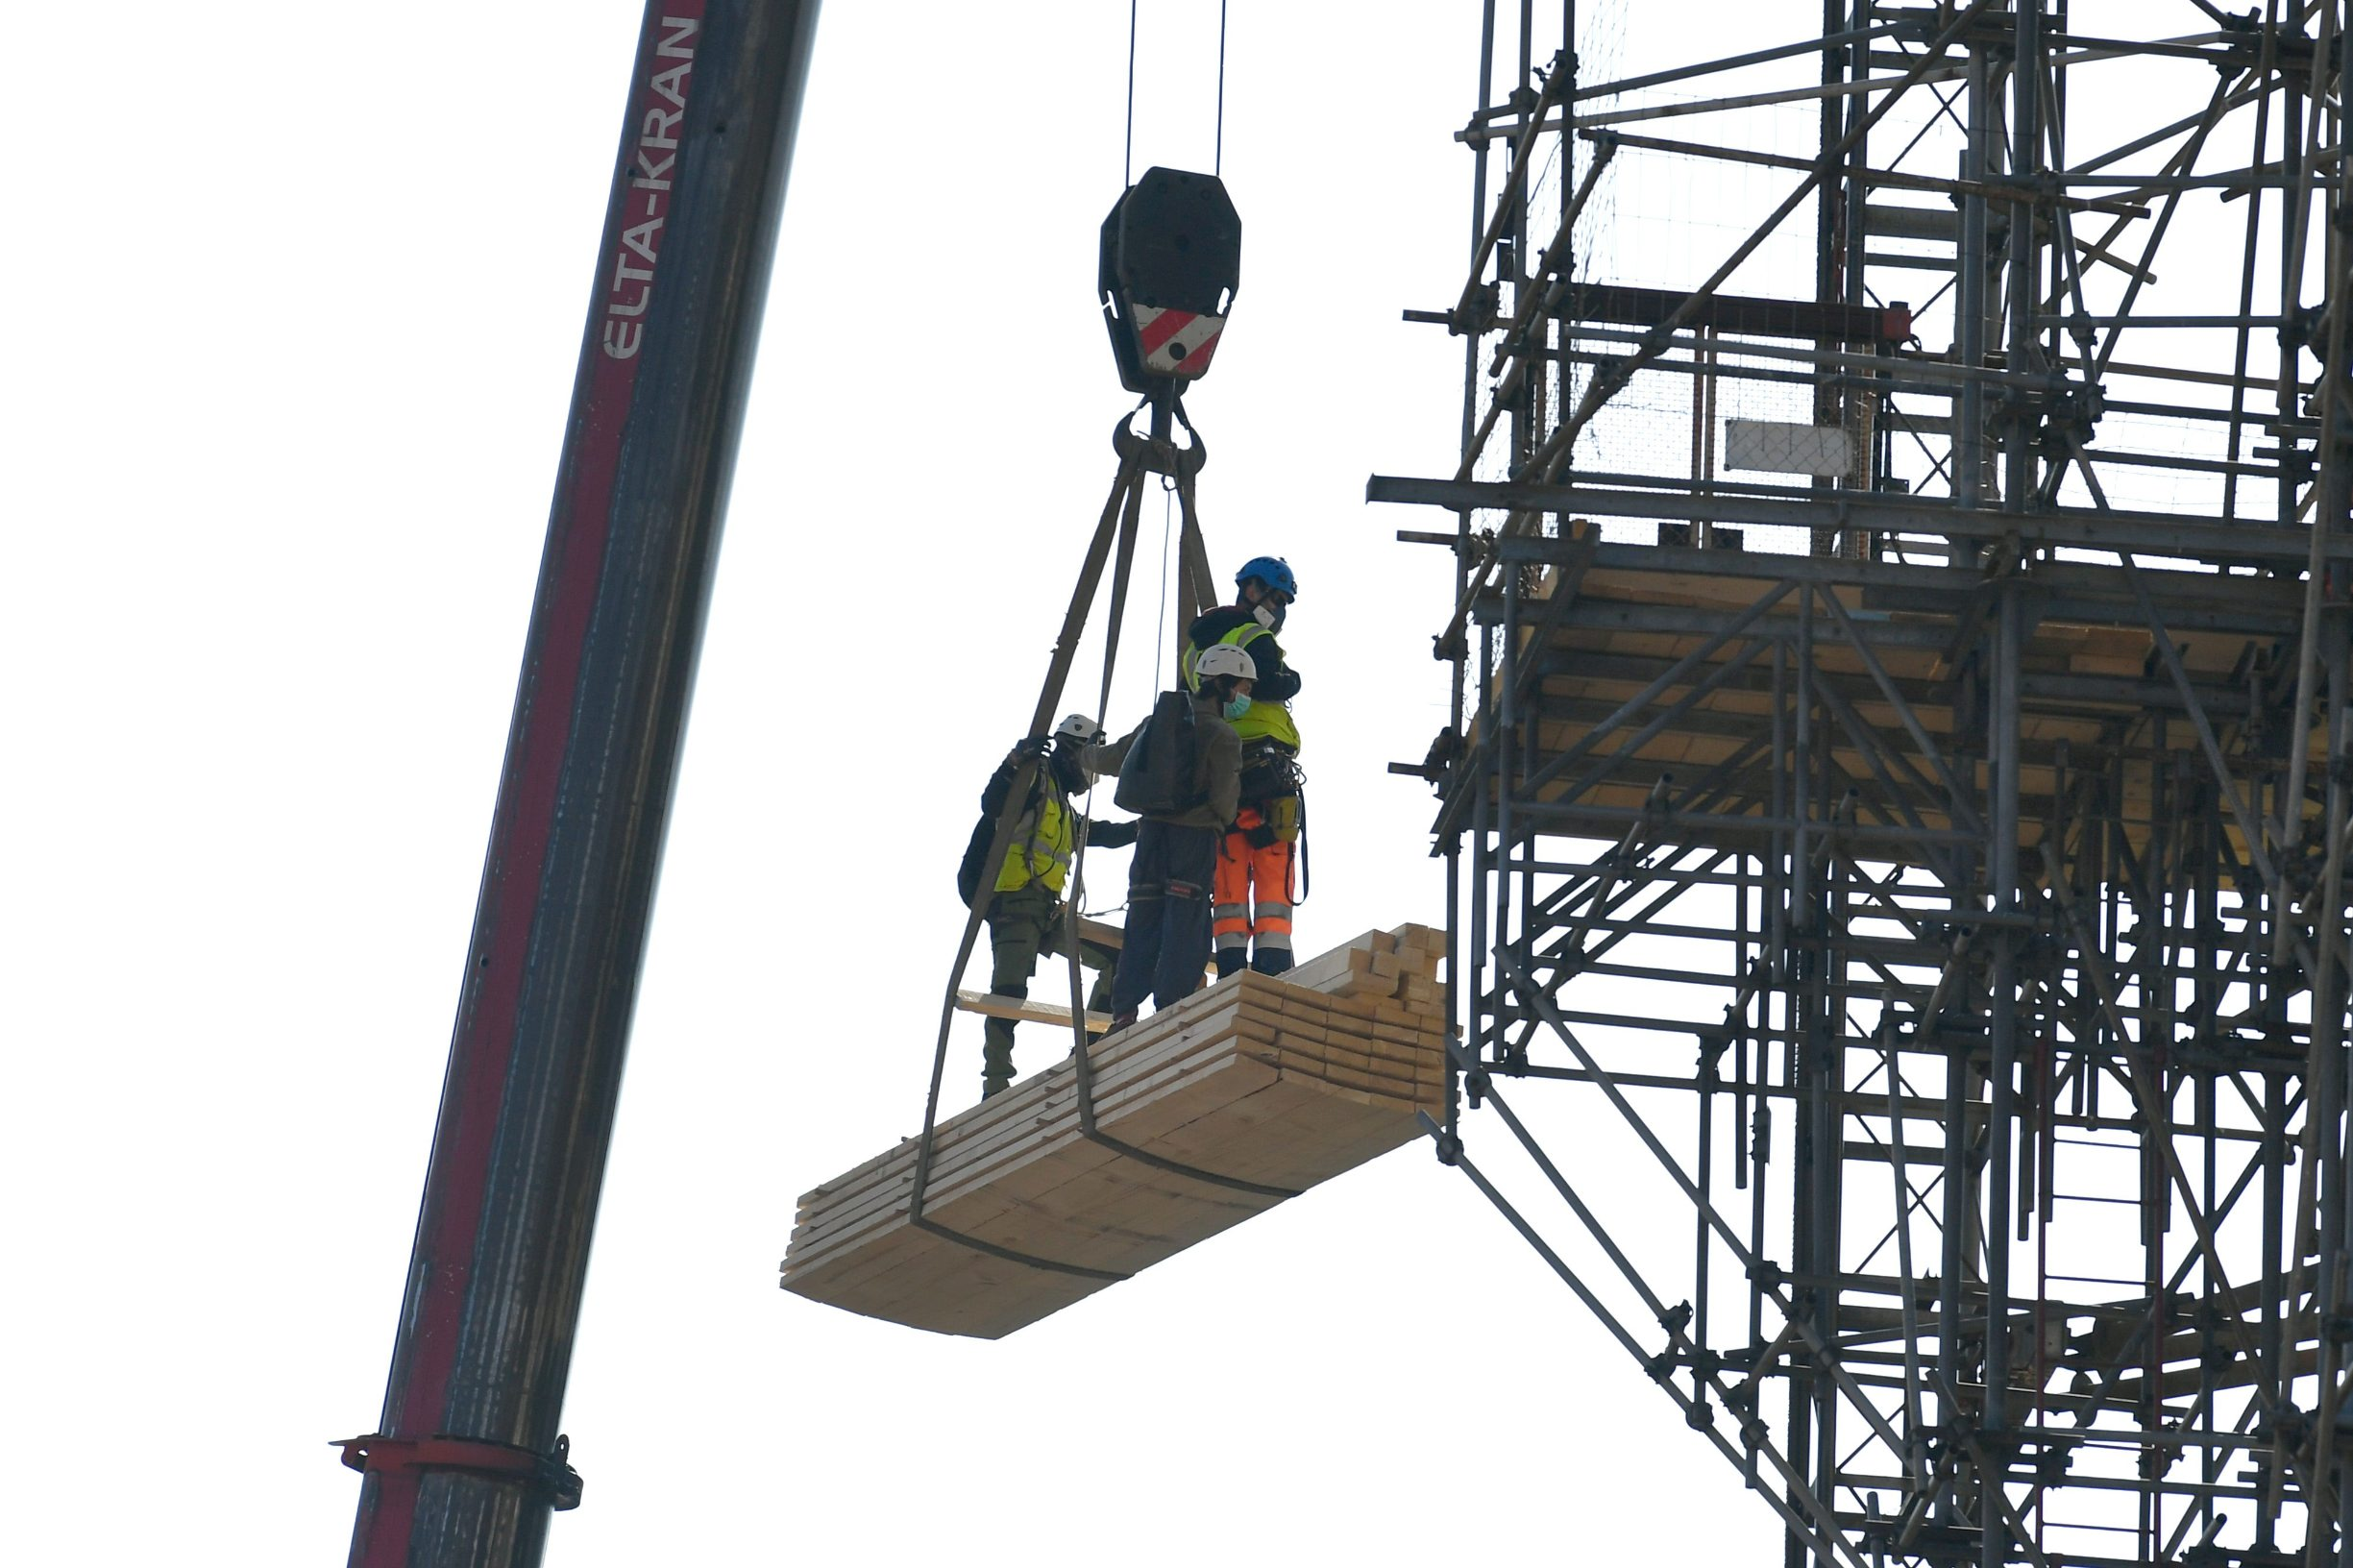 Zagreb, 040420. Kaptol. Reportaza o radovima na katedrali. Na fotografiji: Alpinisti na dizalici. Foto: Goran Mehkek / CROPIX